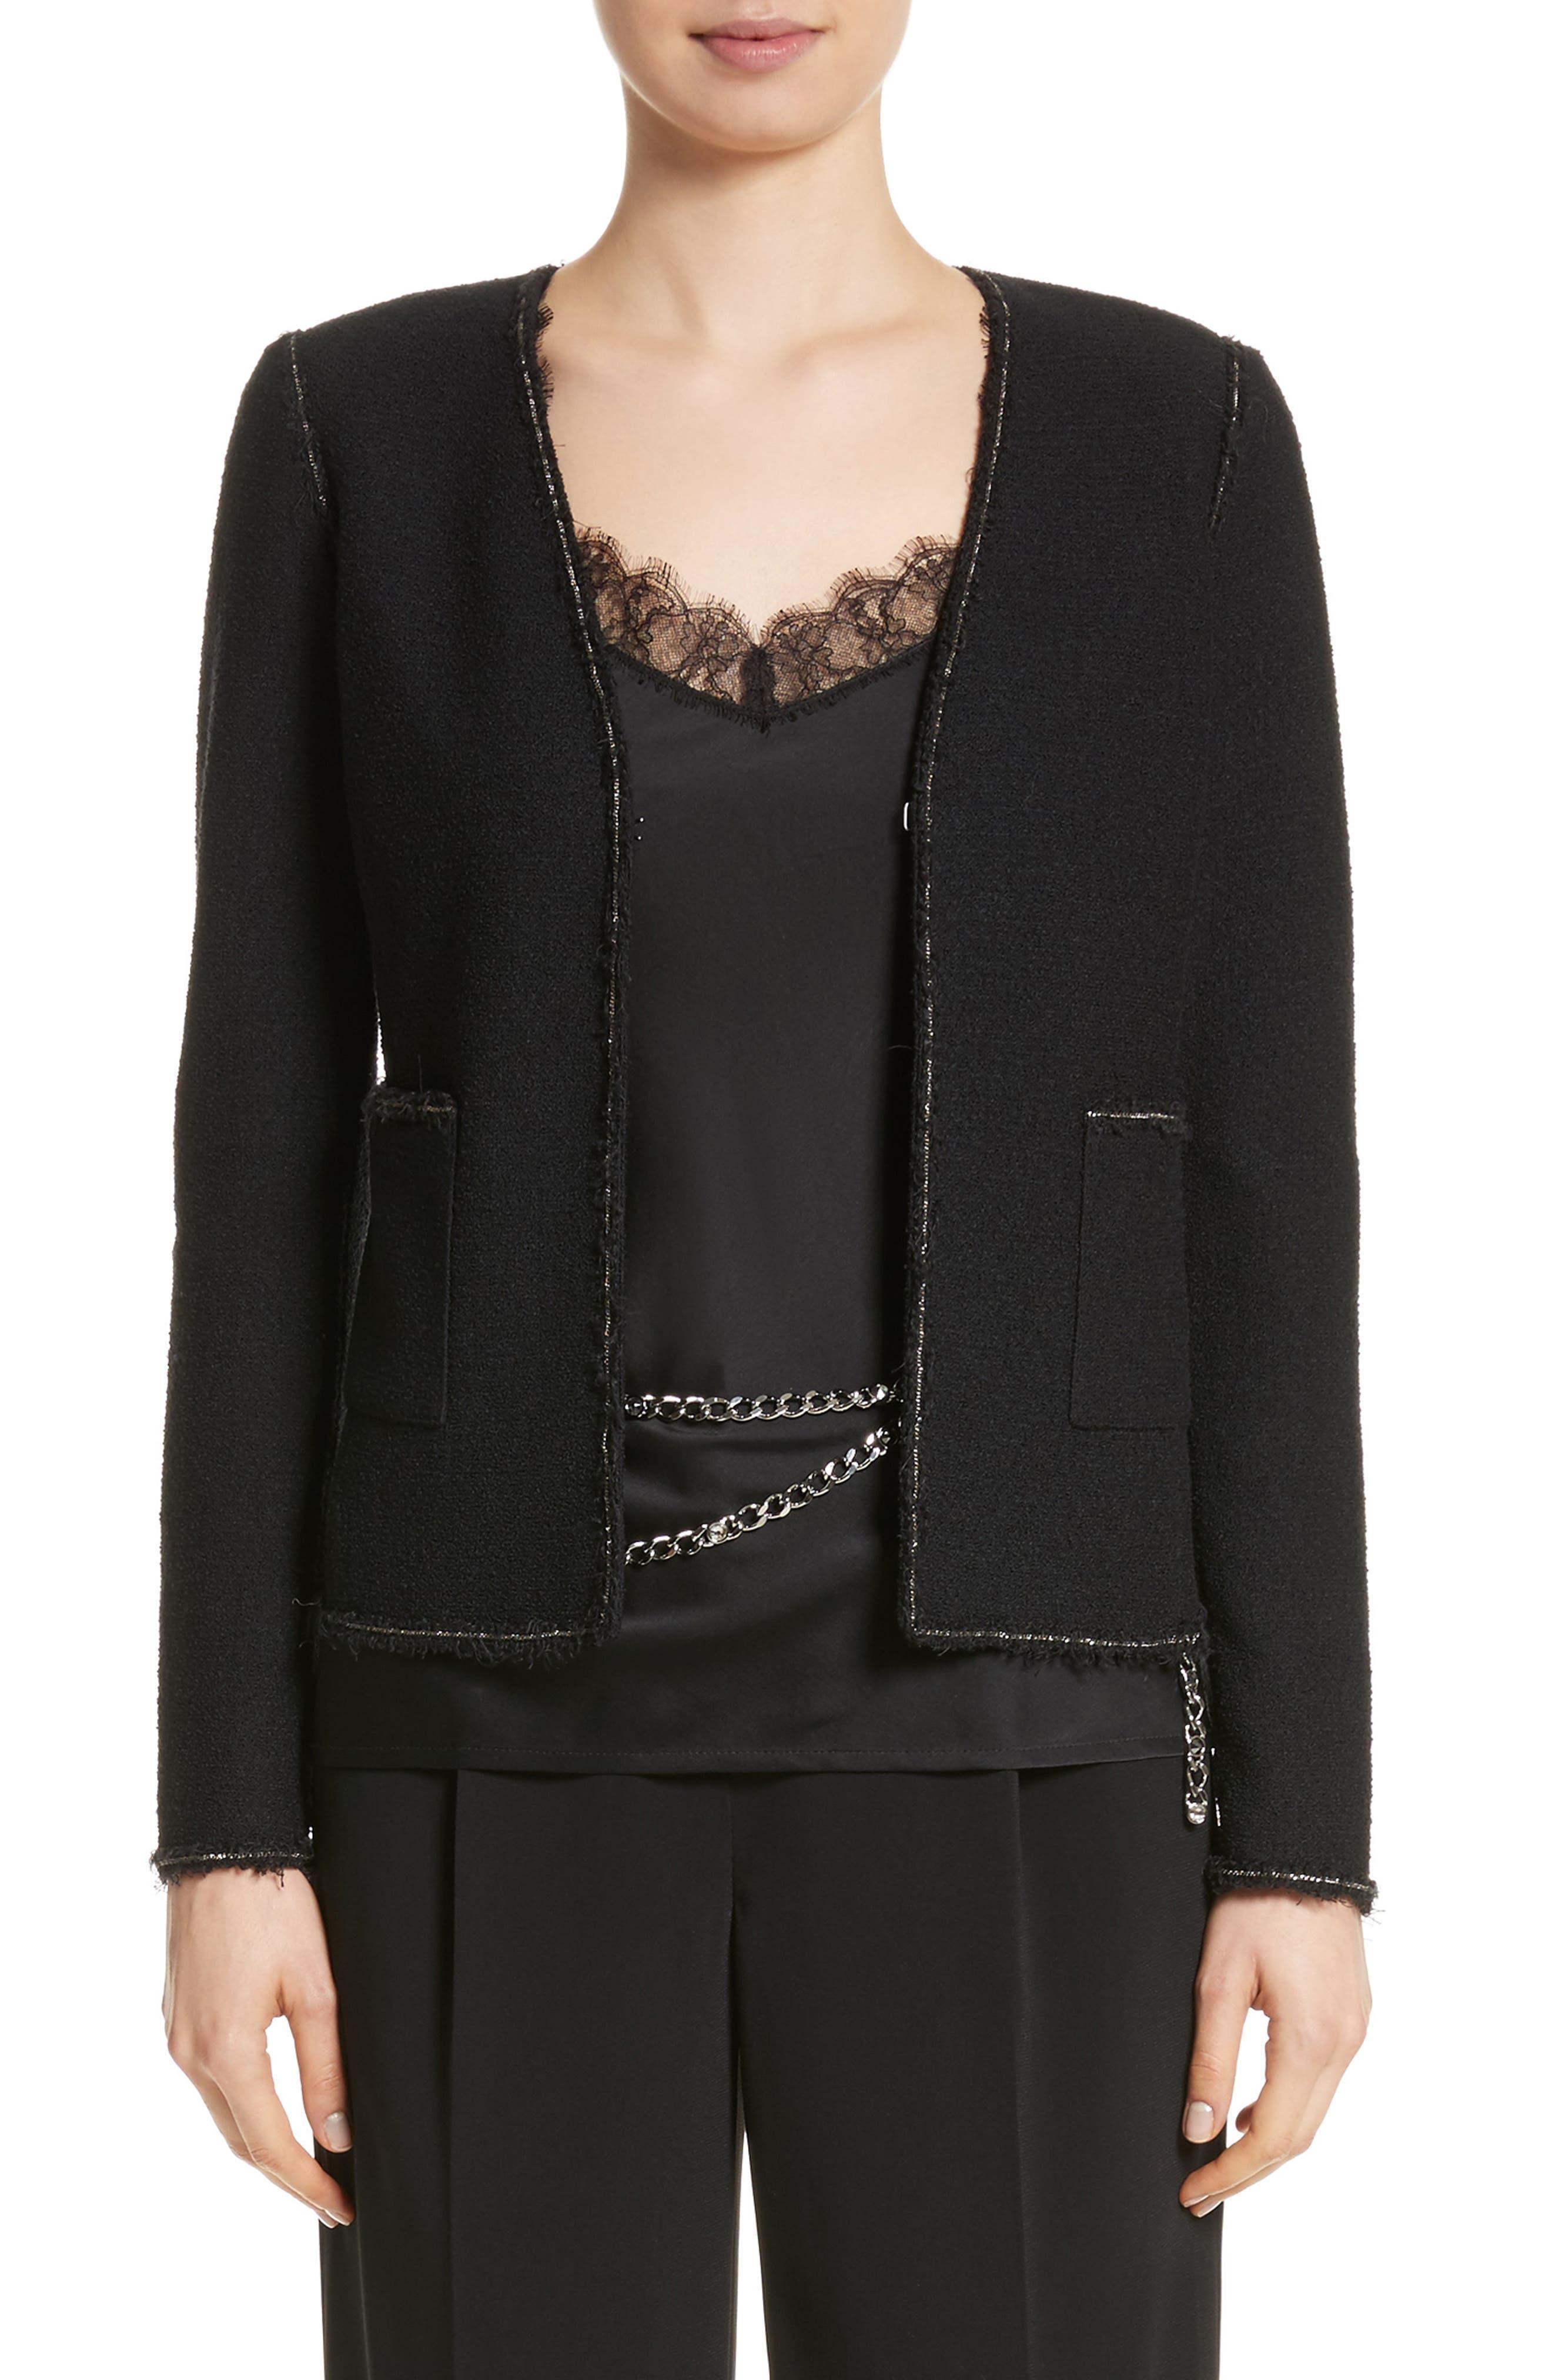 St. John Collection Bouclé Knit Jacket